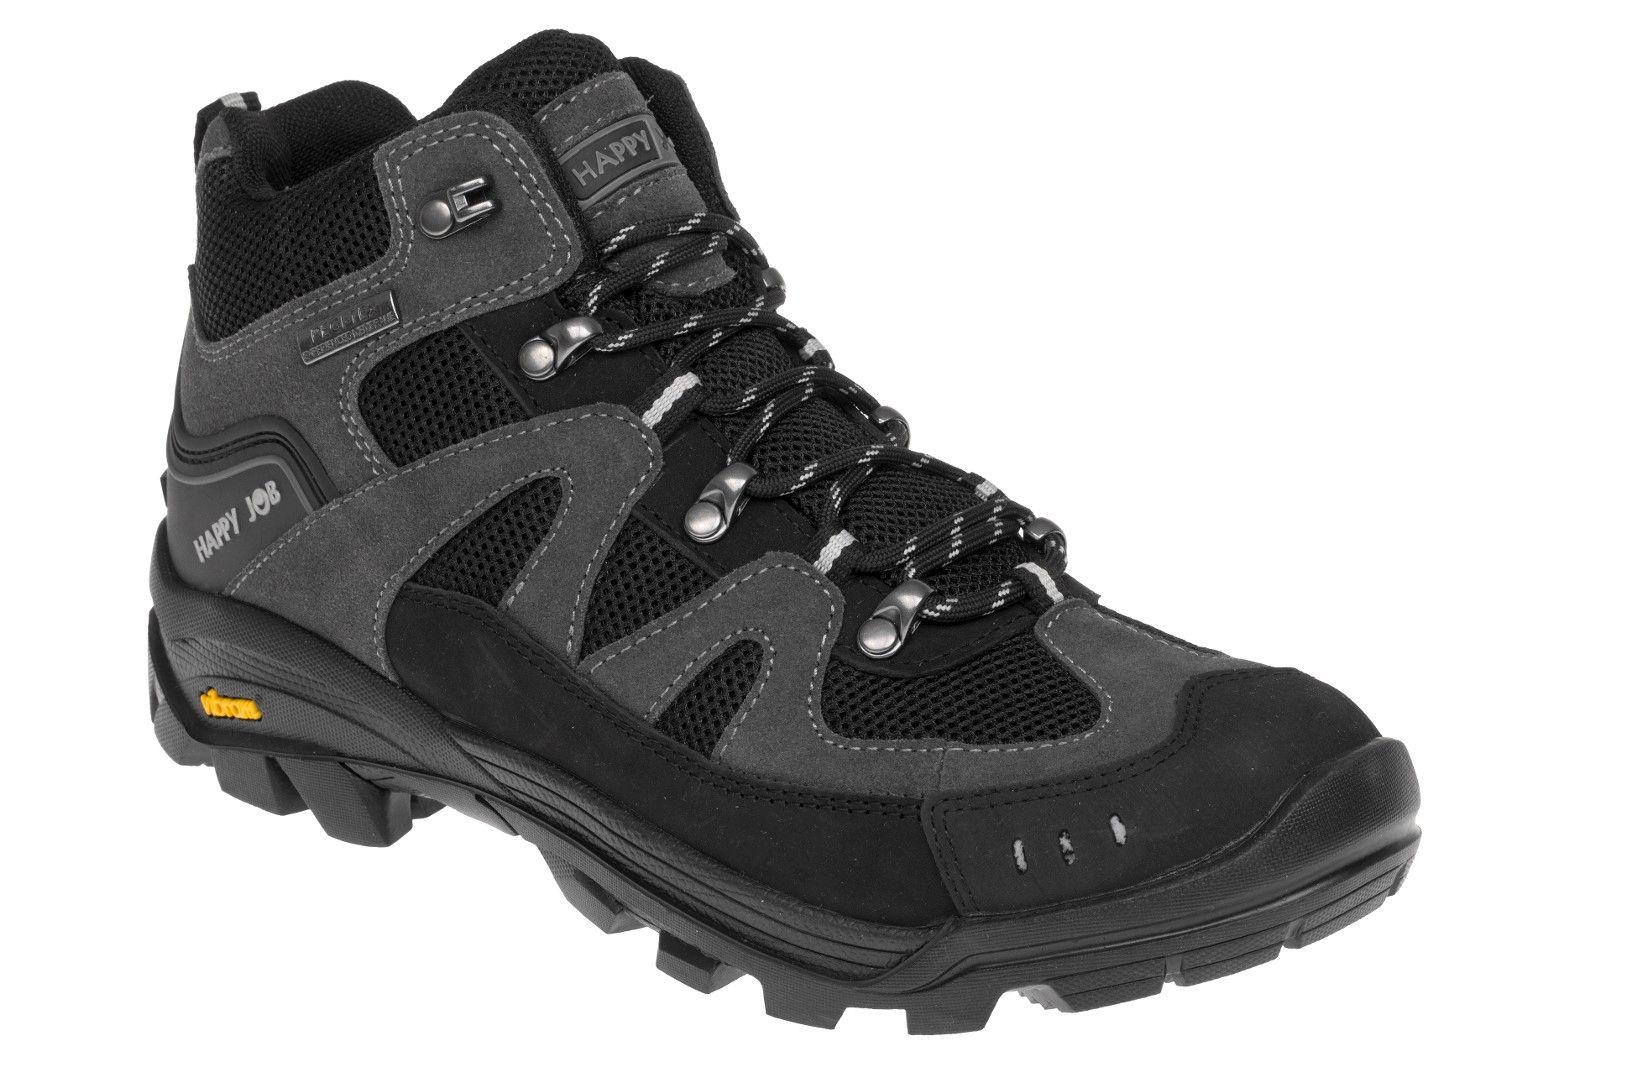 f88cf8f0f38 Trekingová obuv COLORADO